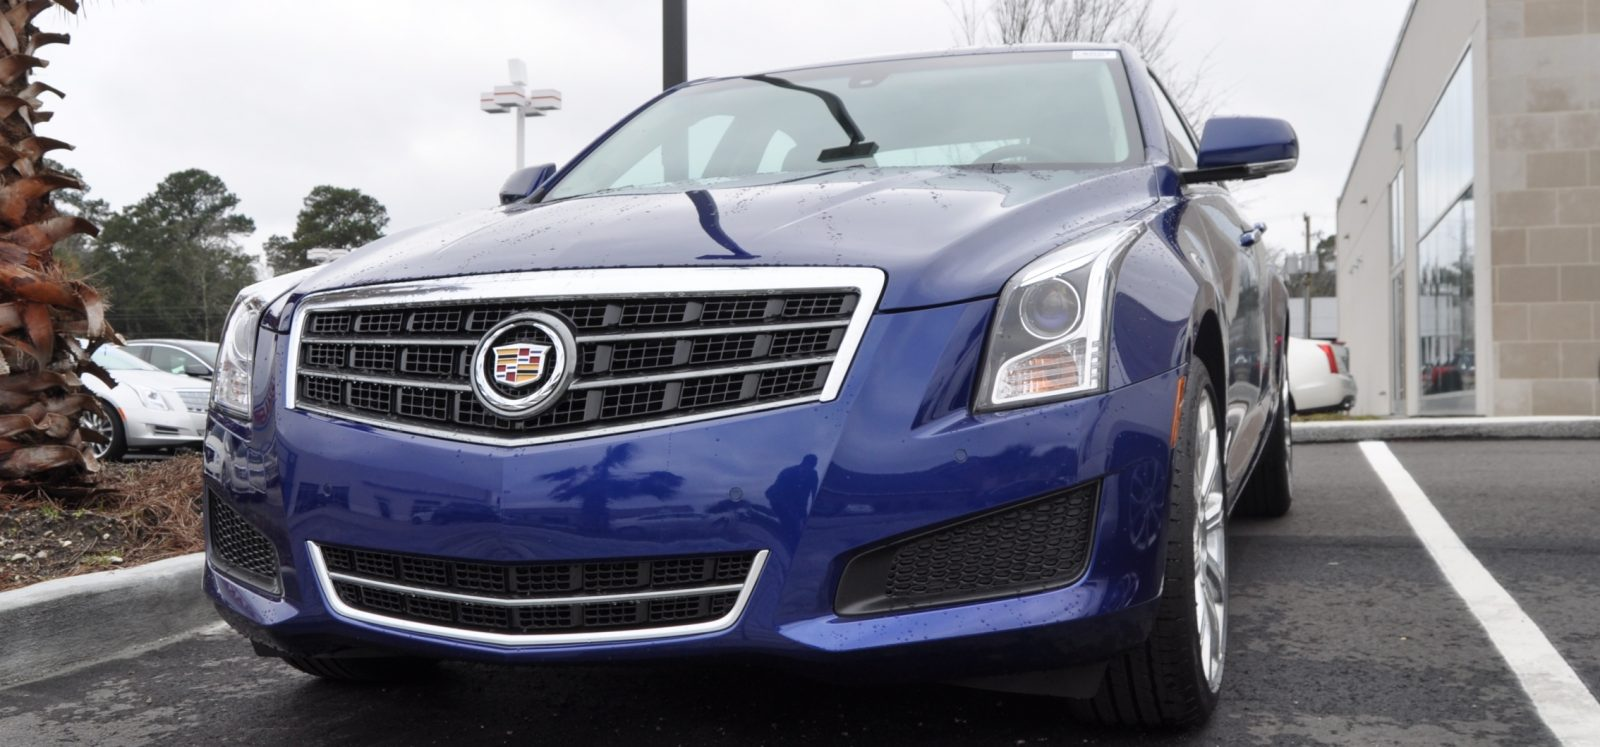 2014 Cadillac ATS4 - High-Res Photos 1